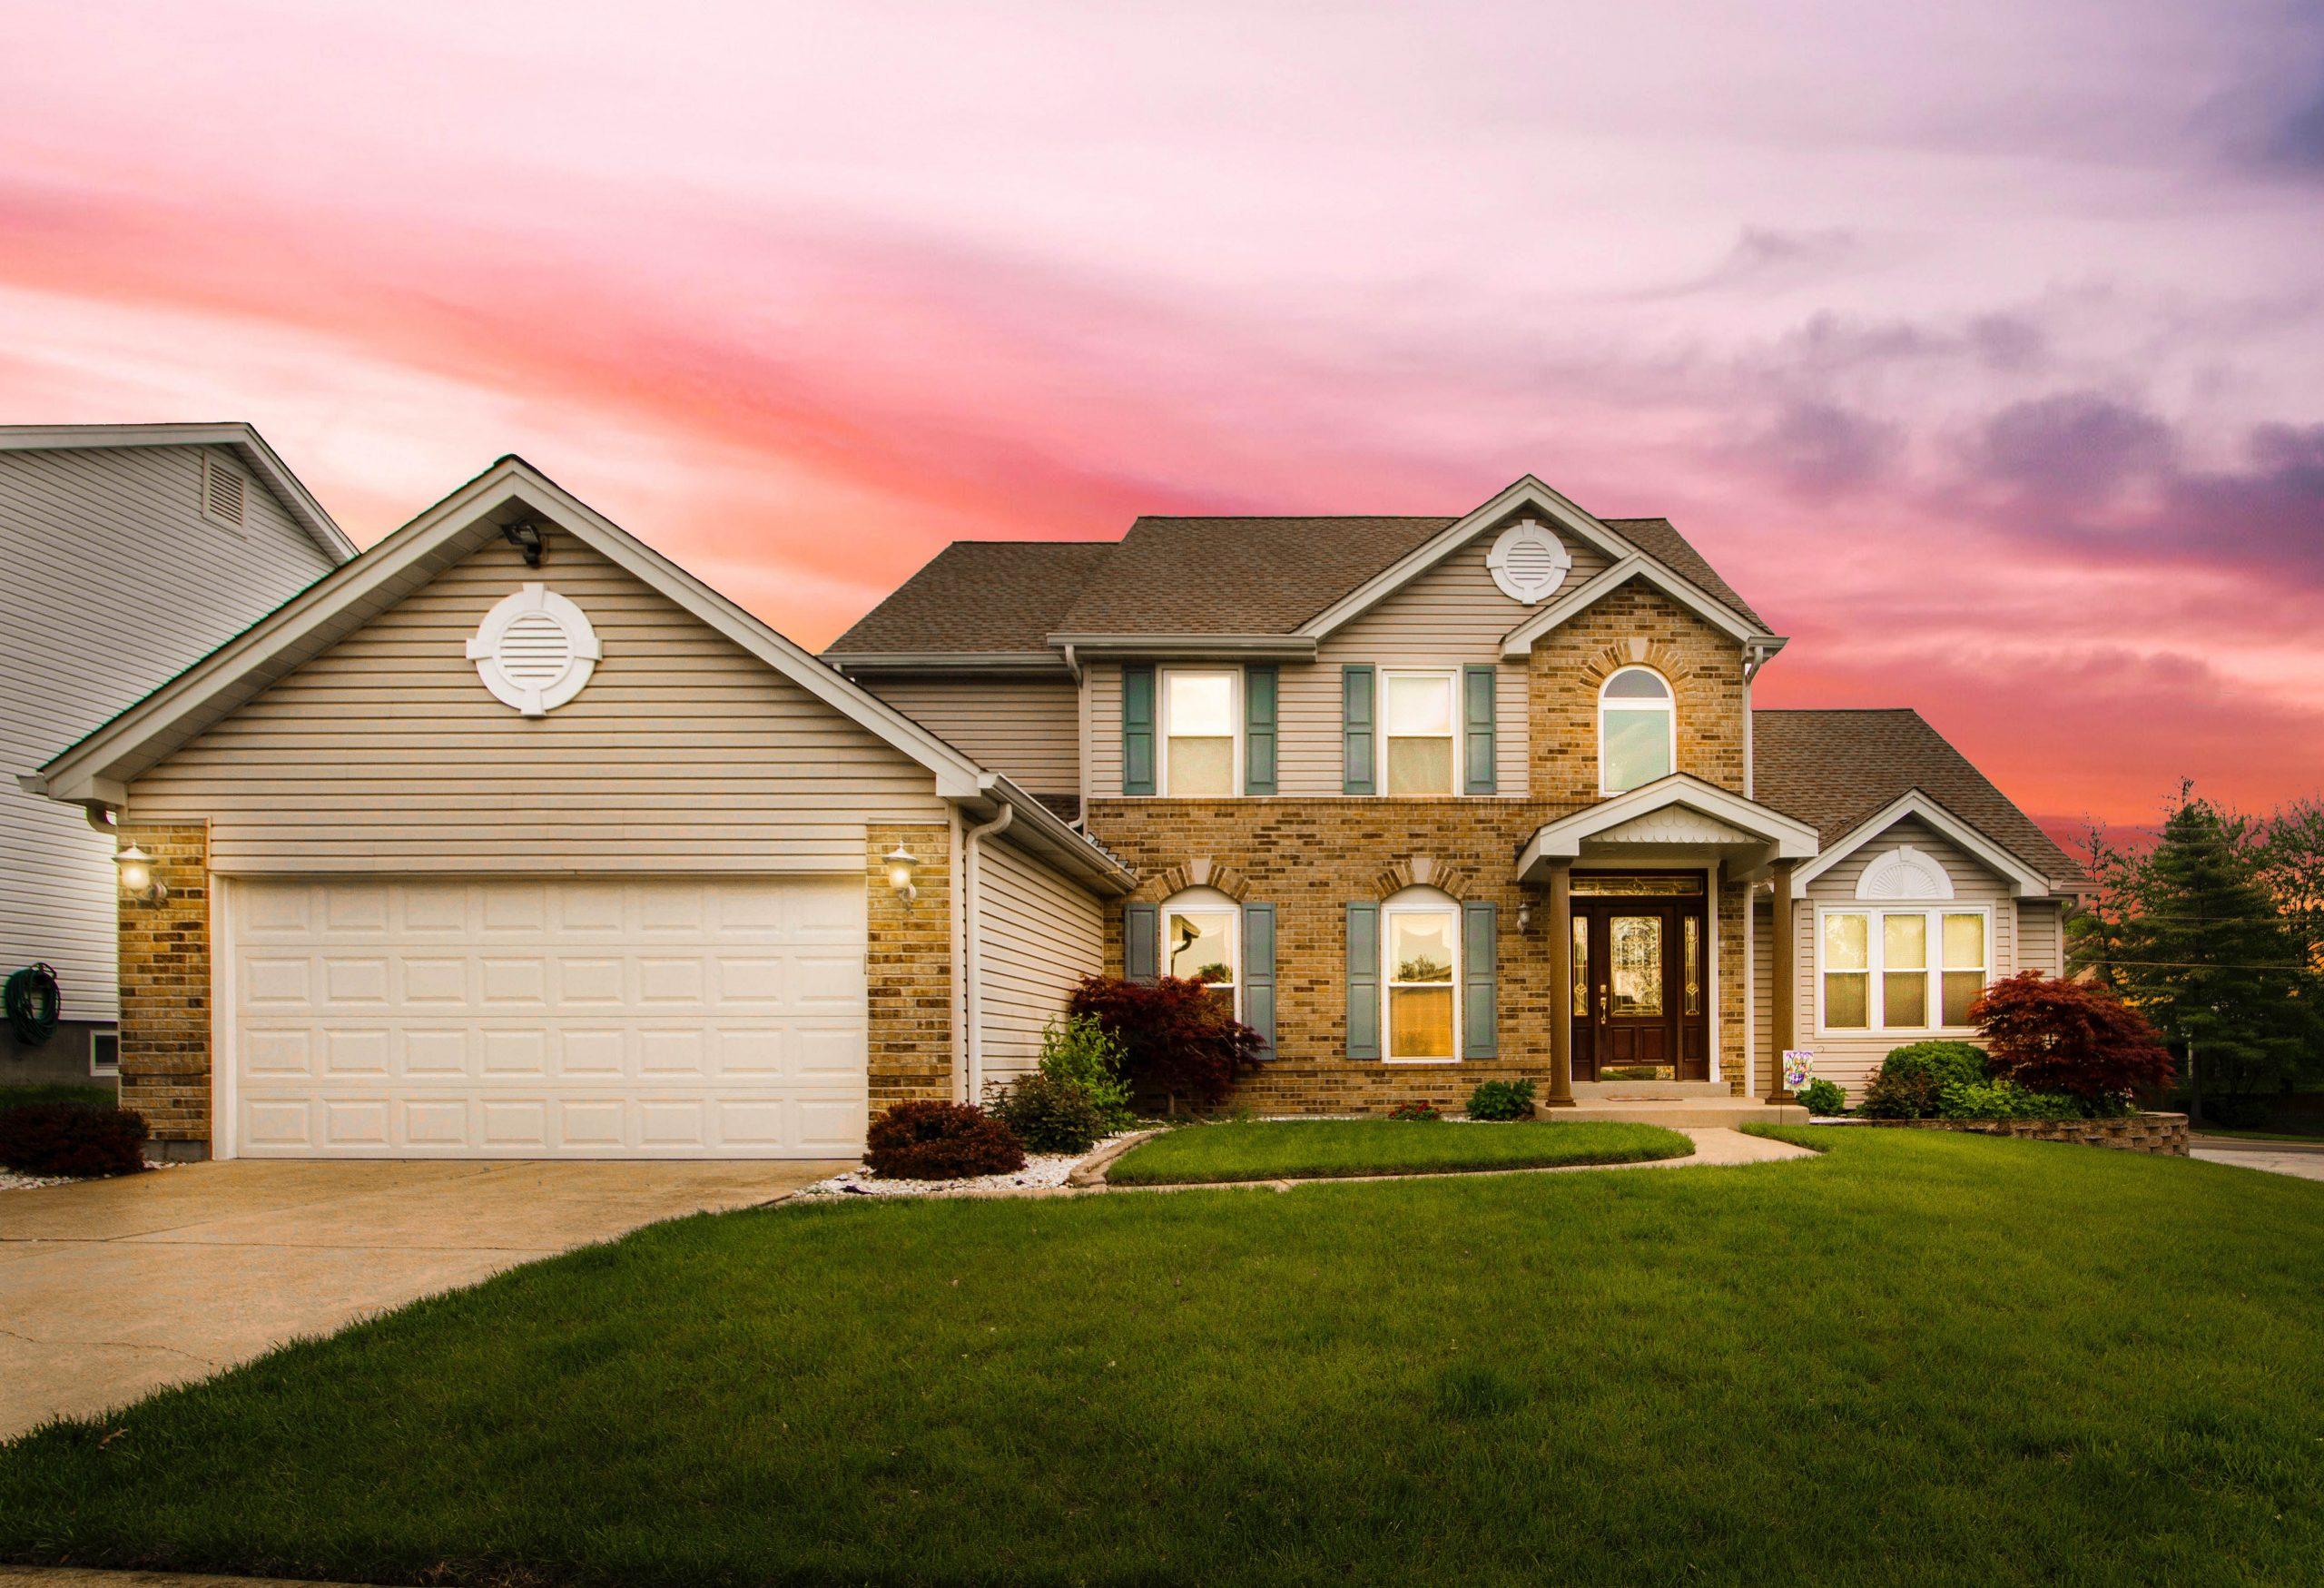 architectural-design-architecture-country-home-2287310